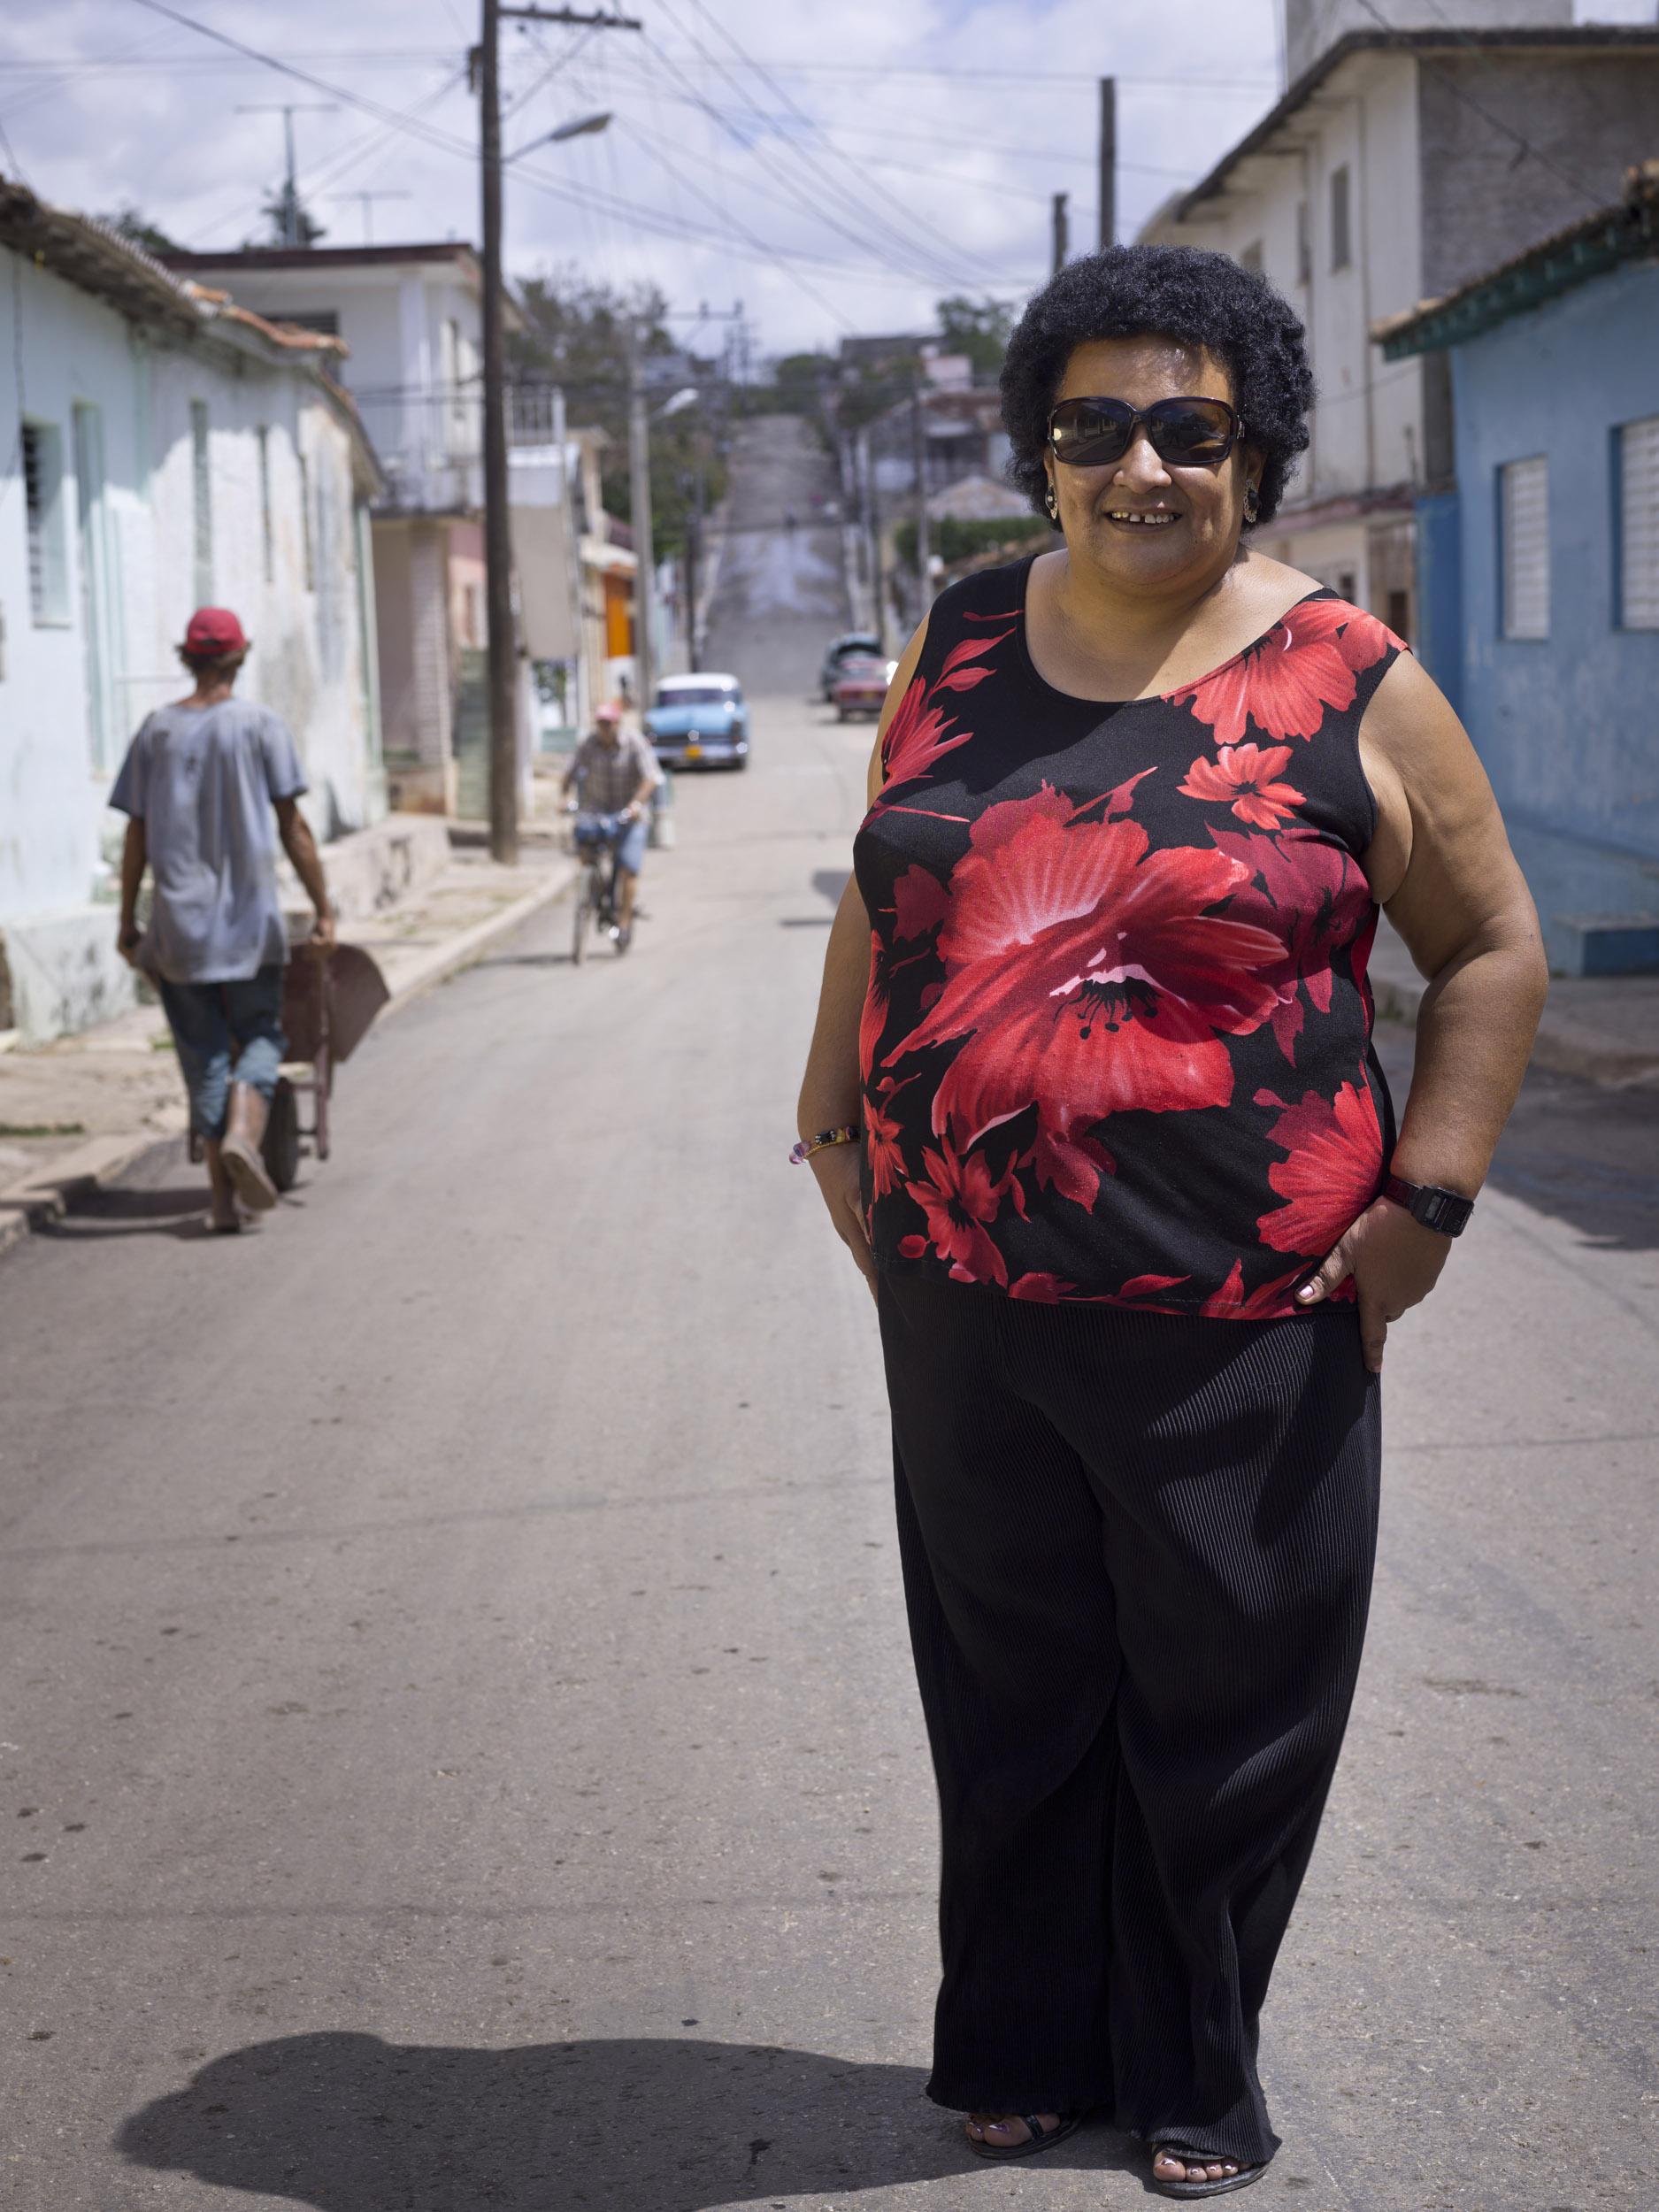 Tomasita Quiala, repentista - Illuminated Cuba - Hector Garrido, Aerial and human photography